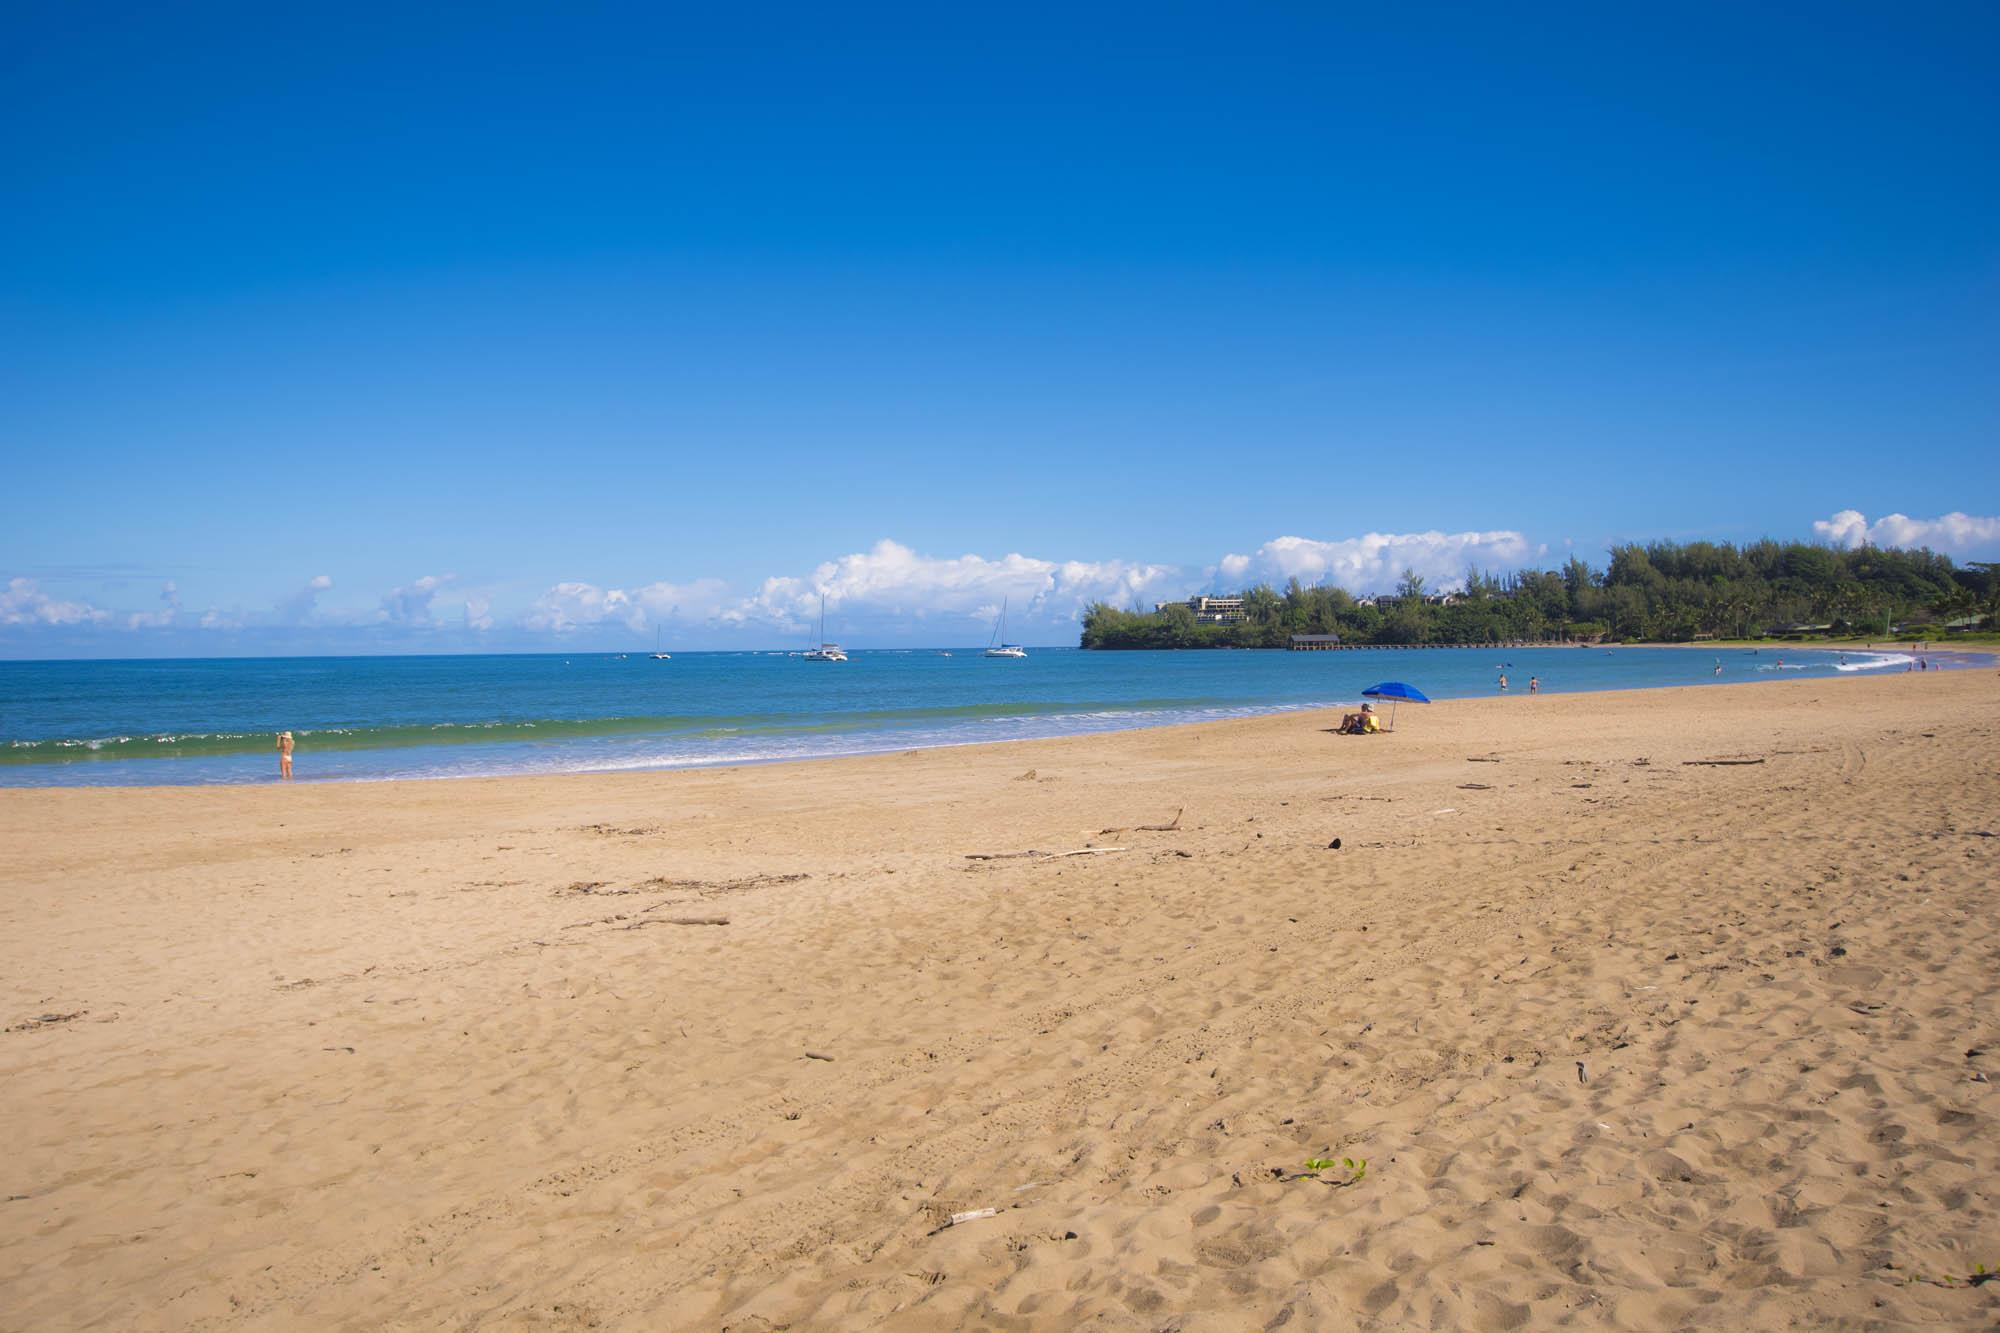 Kauai-217-Hanalei Bay49